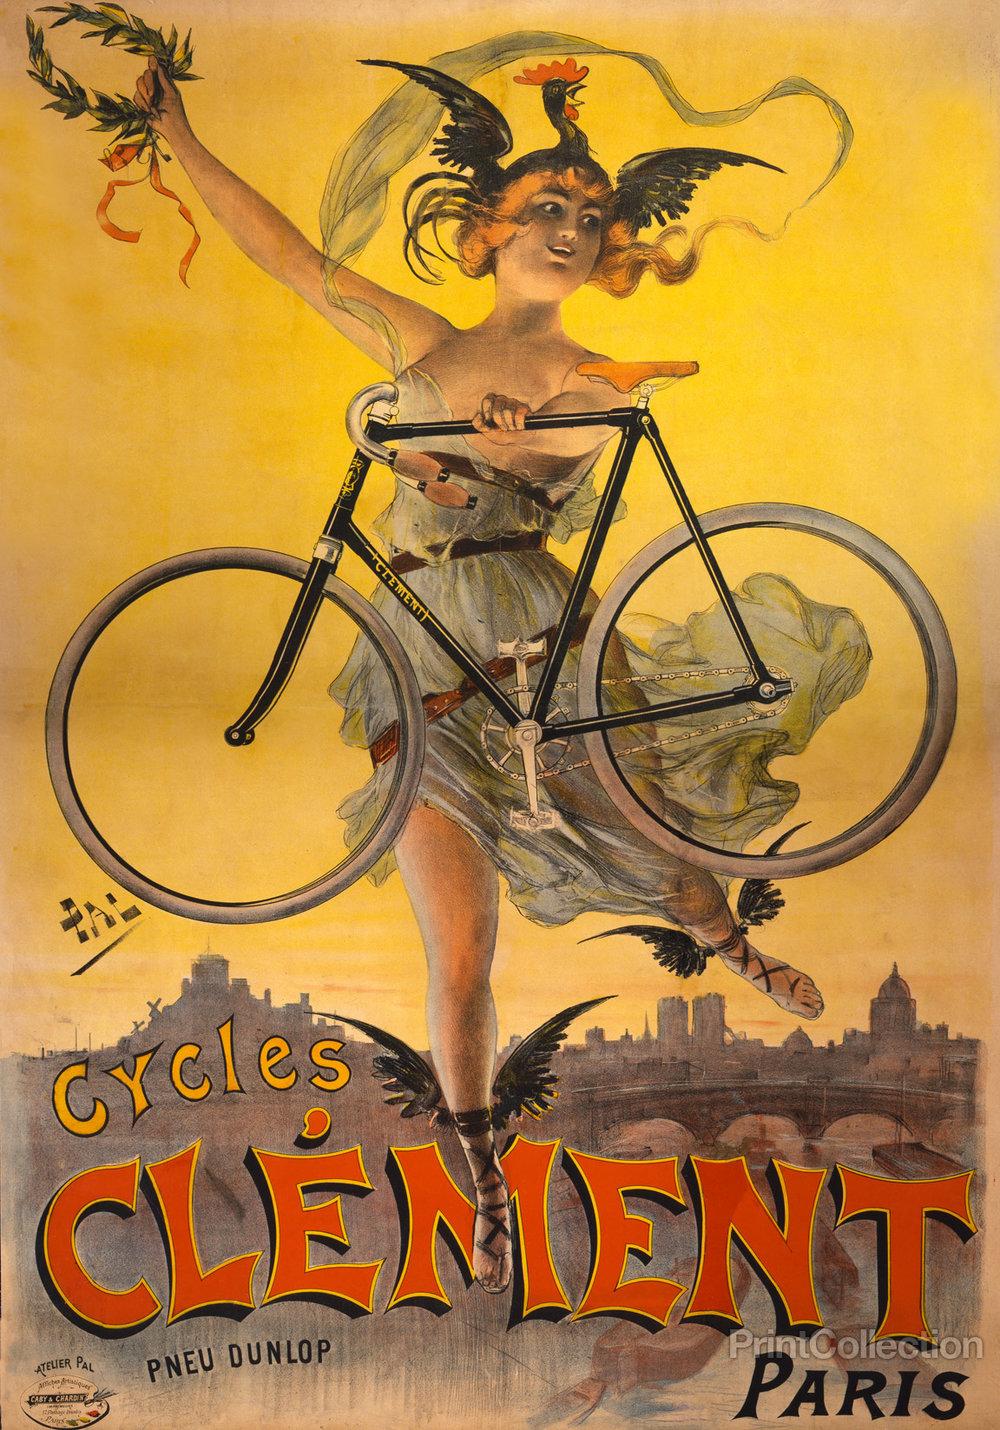 Best of Boneshaker Vintage Poster 7.jpg